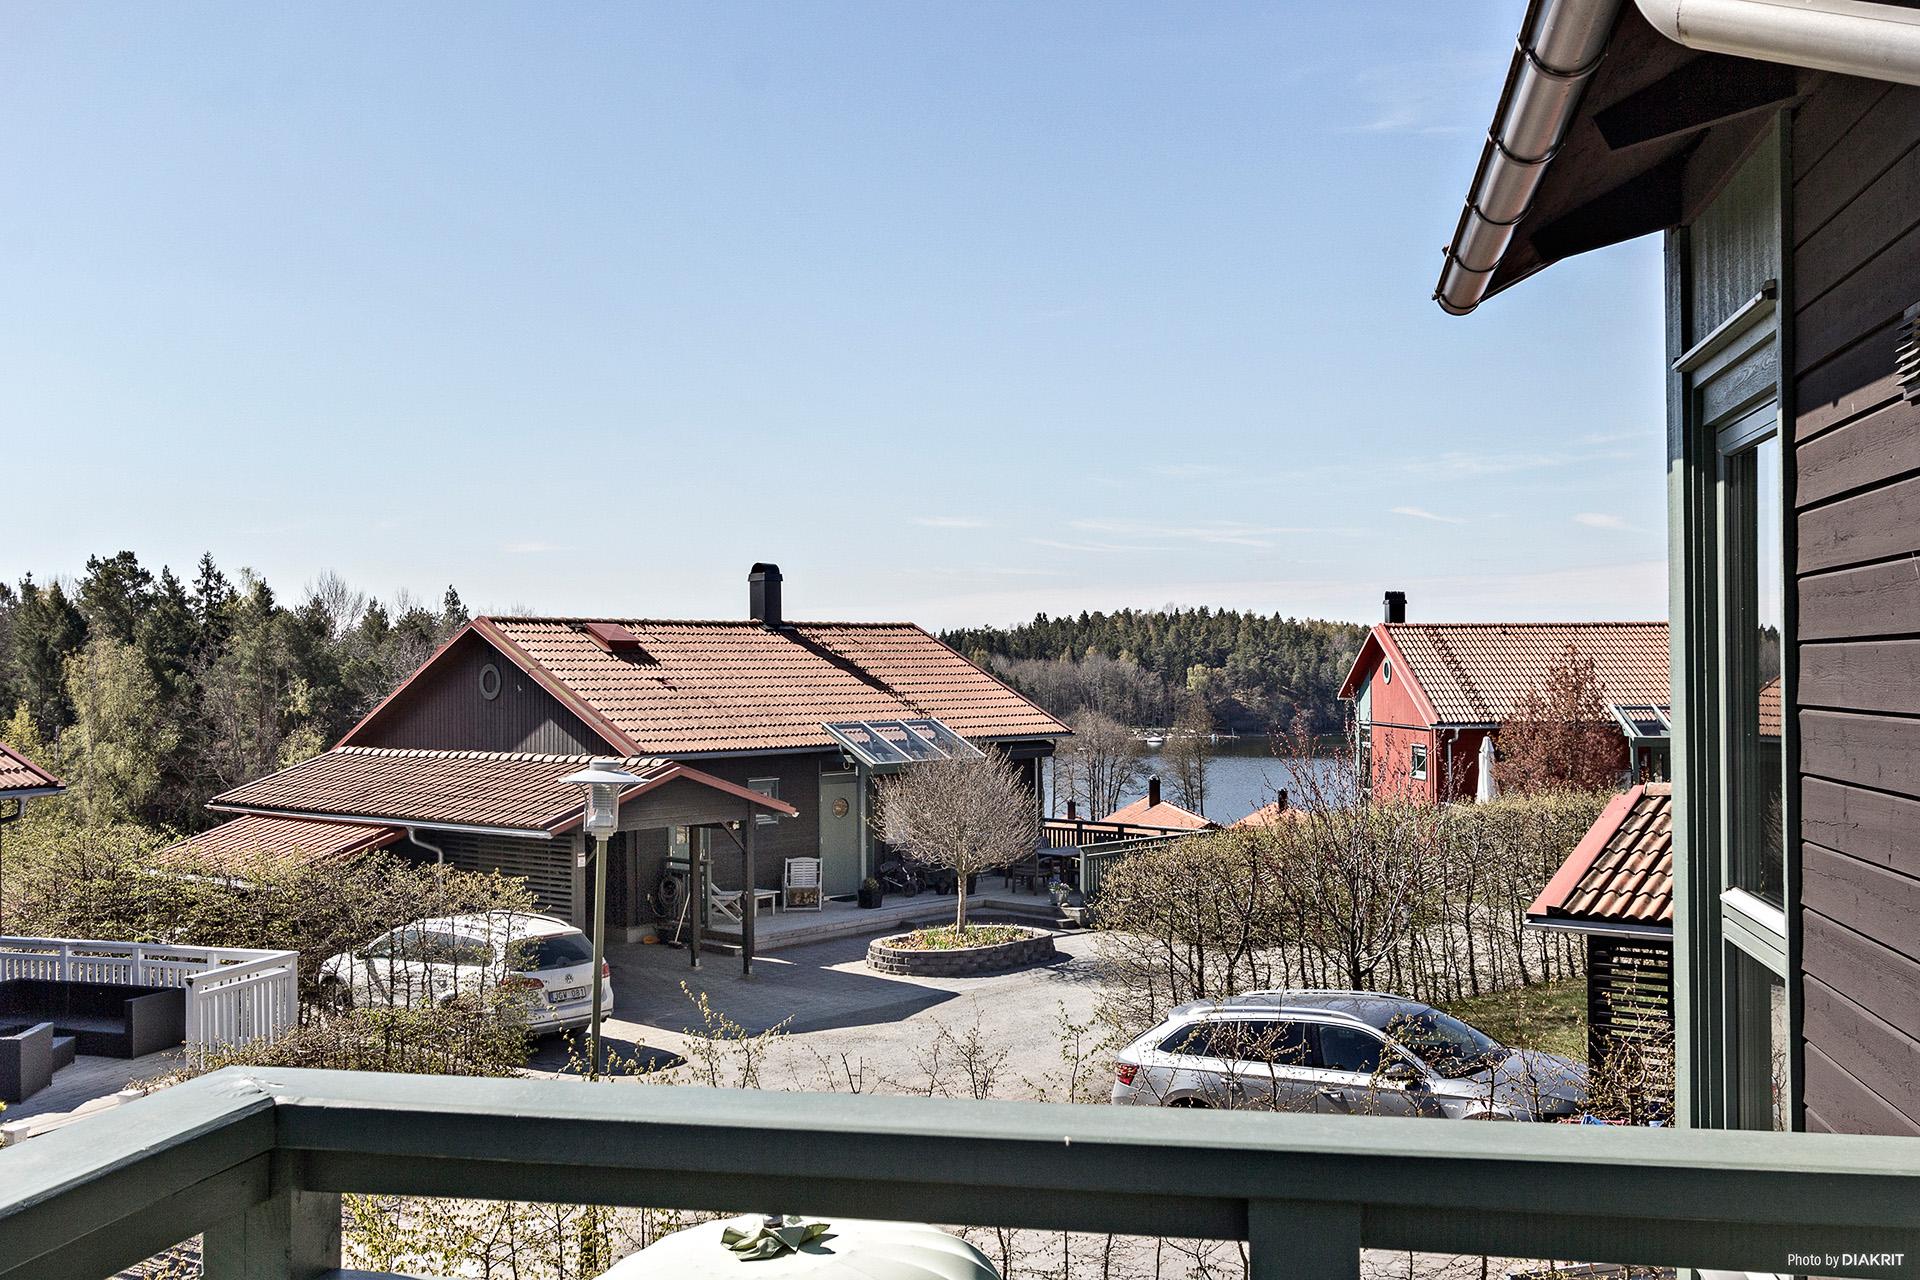 Utsikten från husets balkong